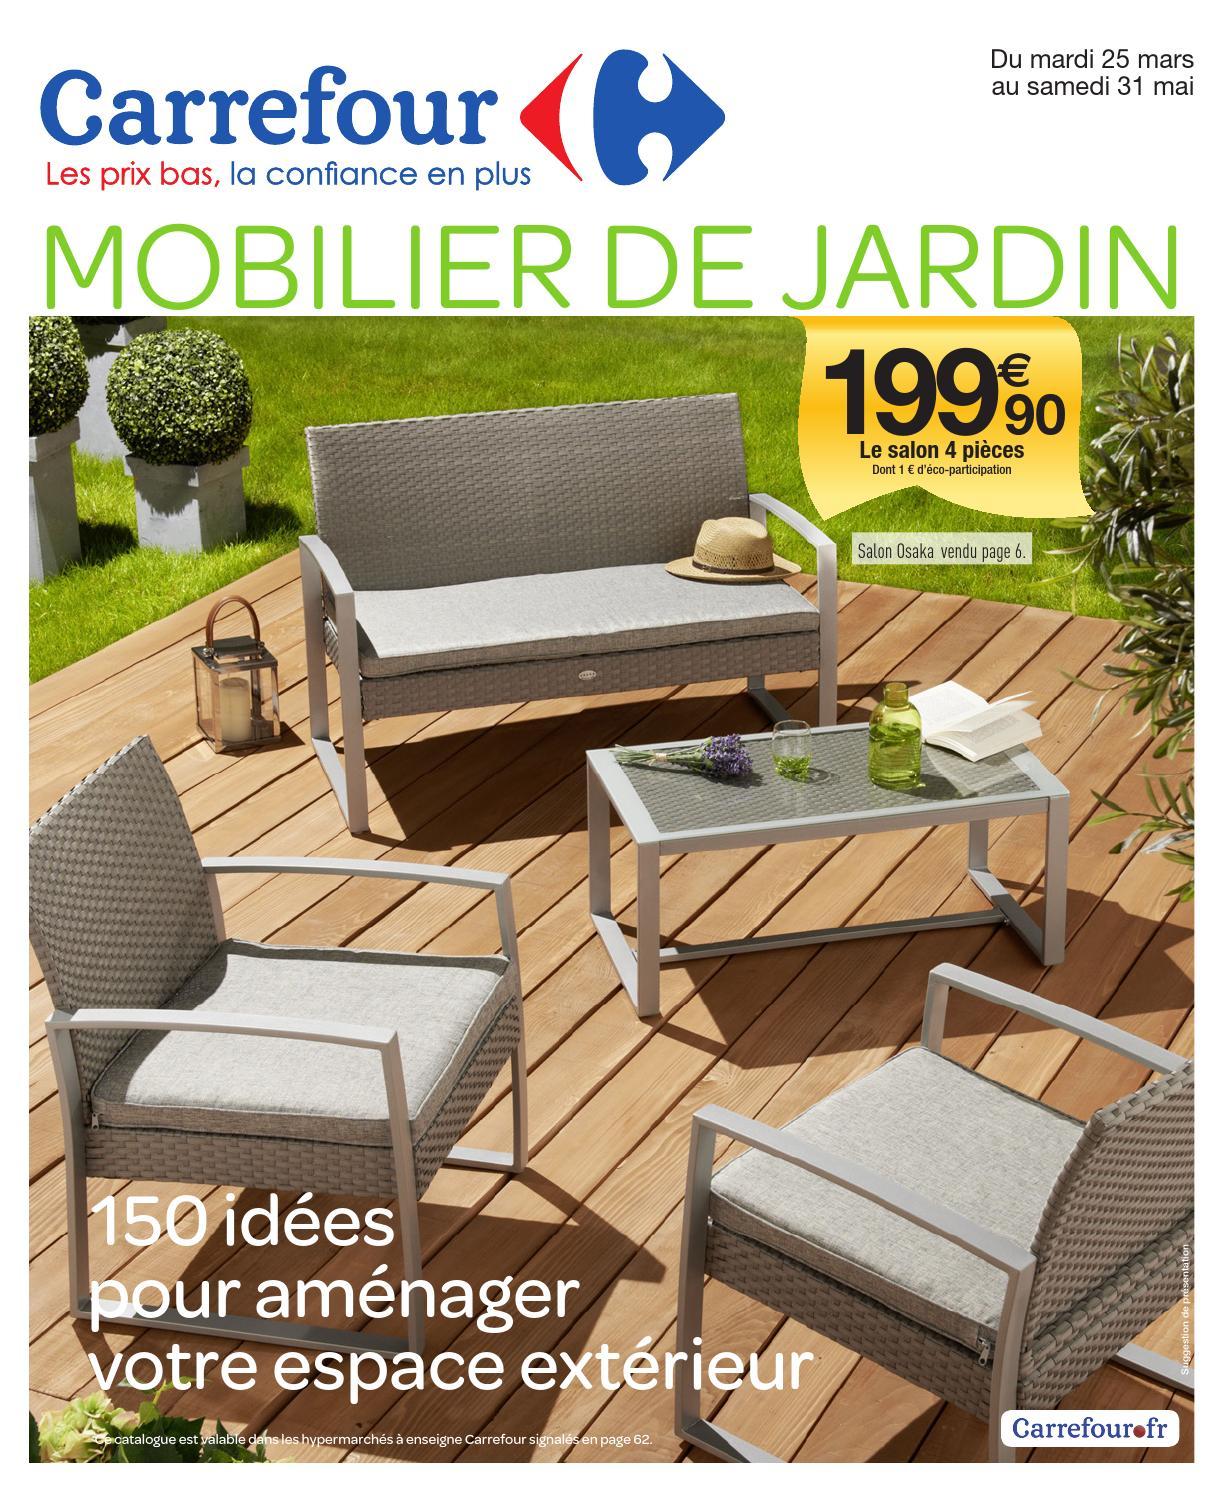 Catalogue Carrefour - 25.03-31.05.2014 By Joe Monroe - Issuu concernant Salon De Jardin Blanc Carrefour